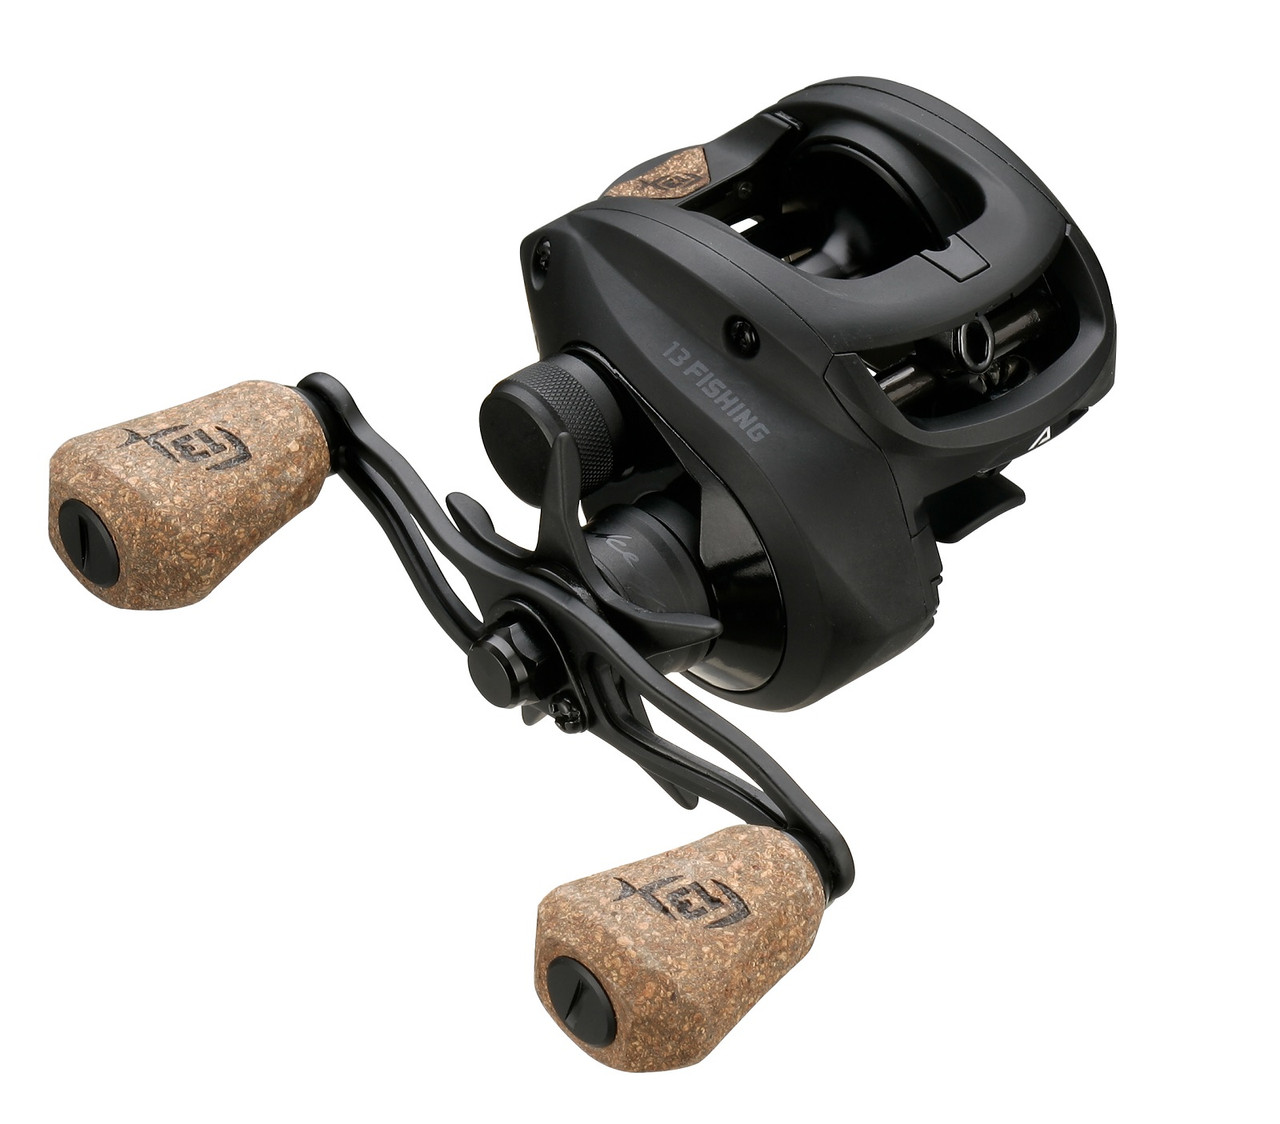 13 Fishing Concept A Gen II Bait Casting Fishing Reel